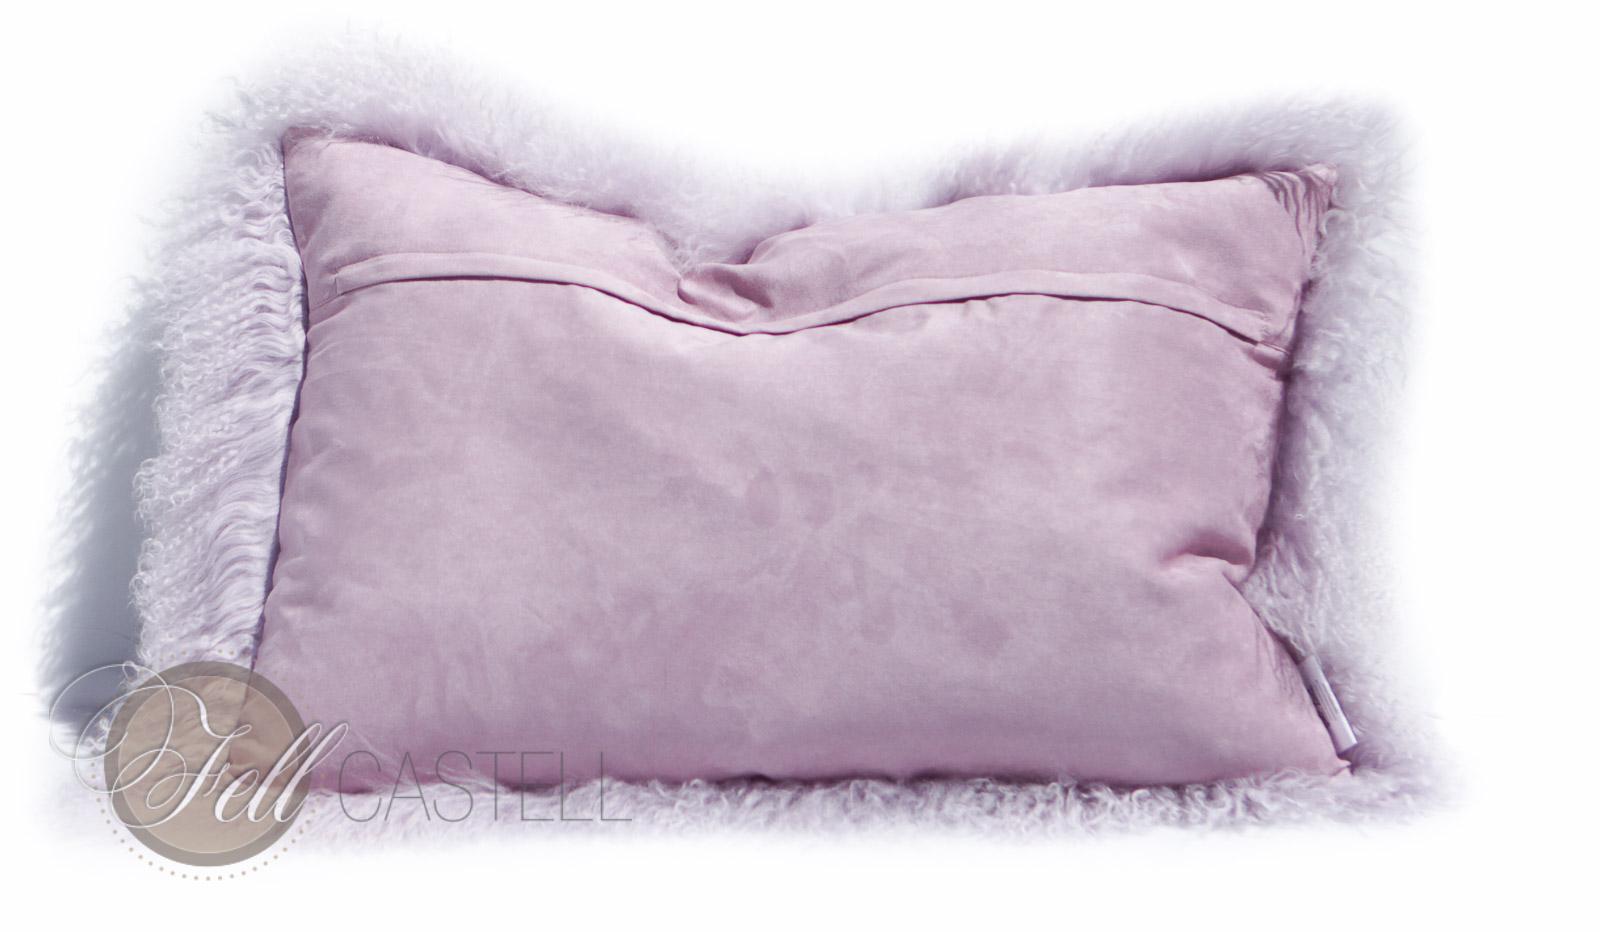 Kissen Tibetlammfell 60 x 40 cm Lavender Fog Fellkissen Tibet Lammfell Mongolisches Lammfell